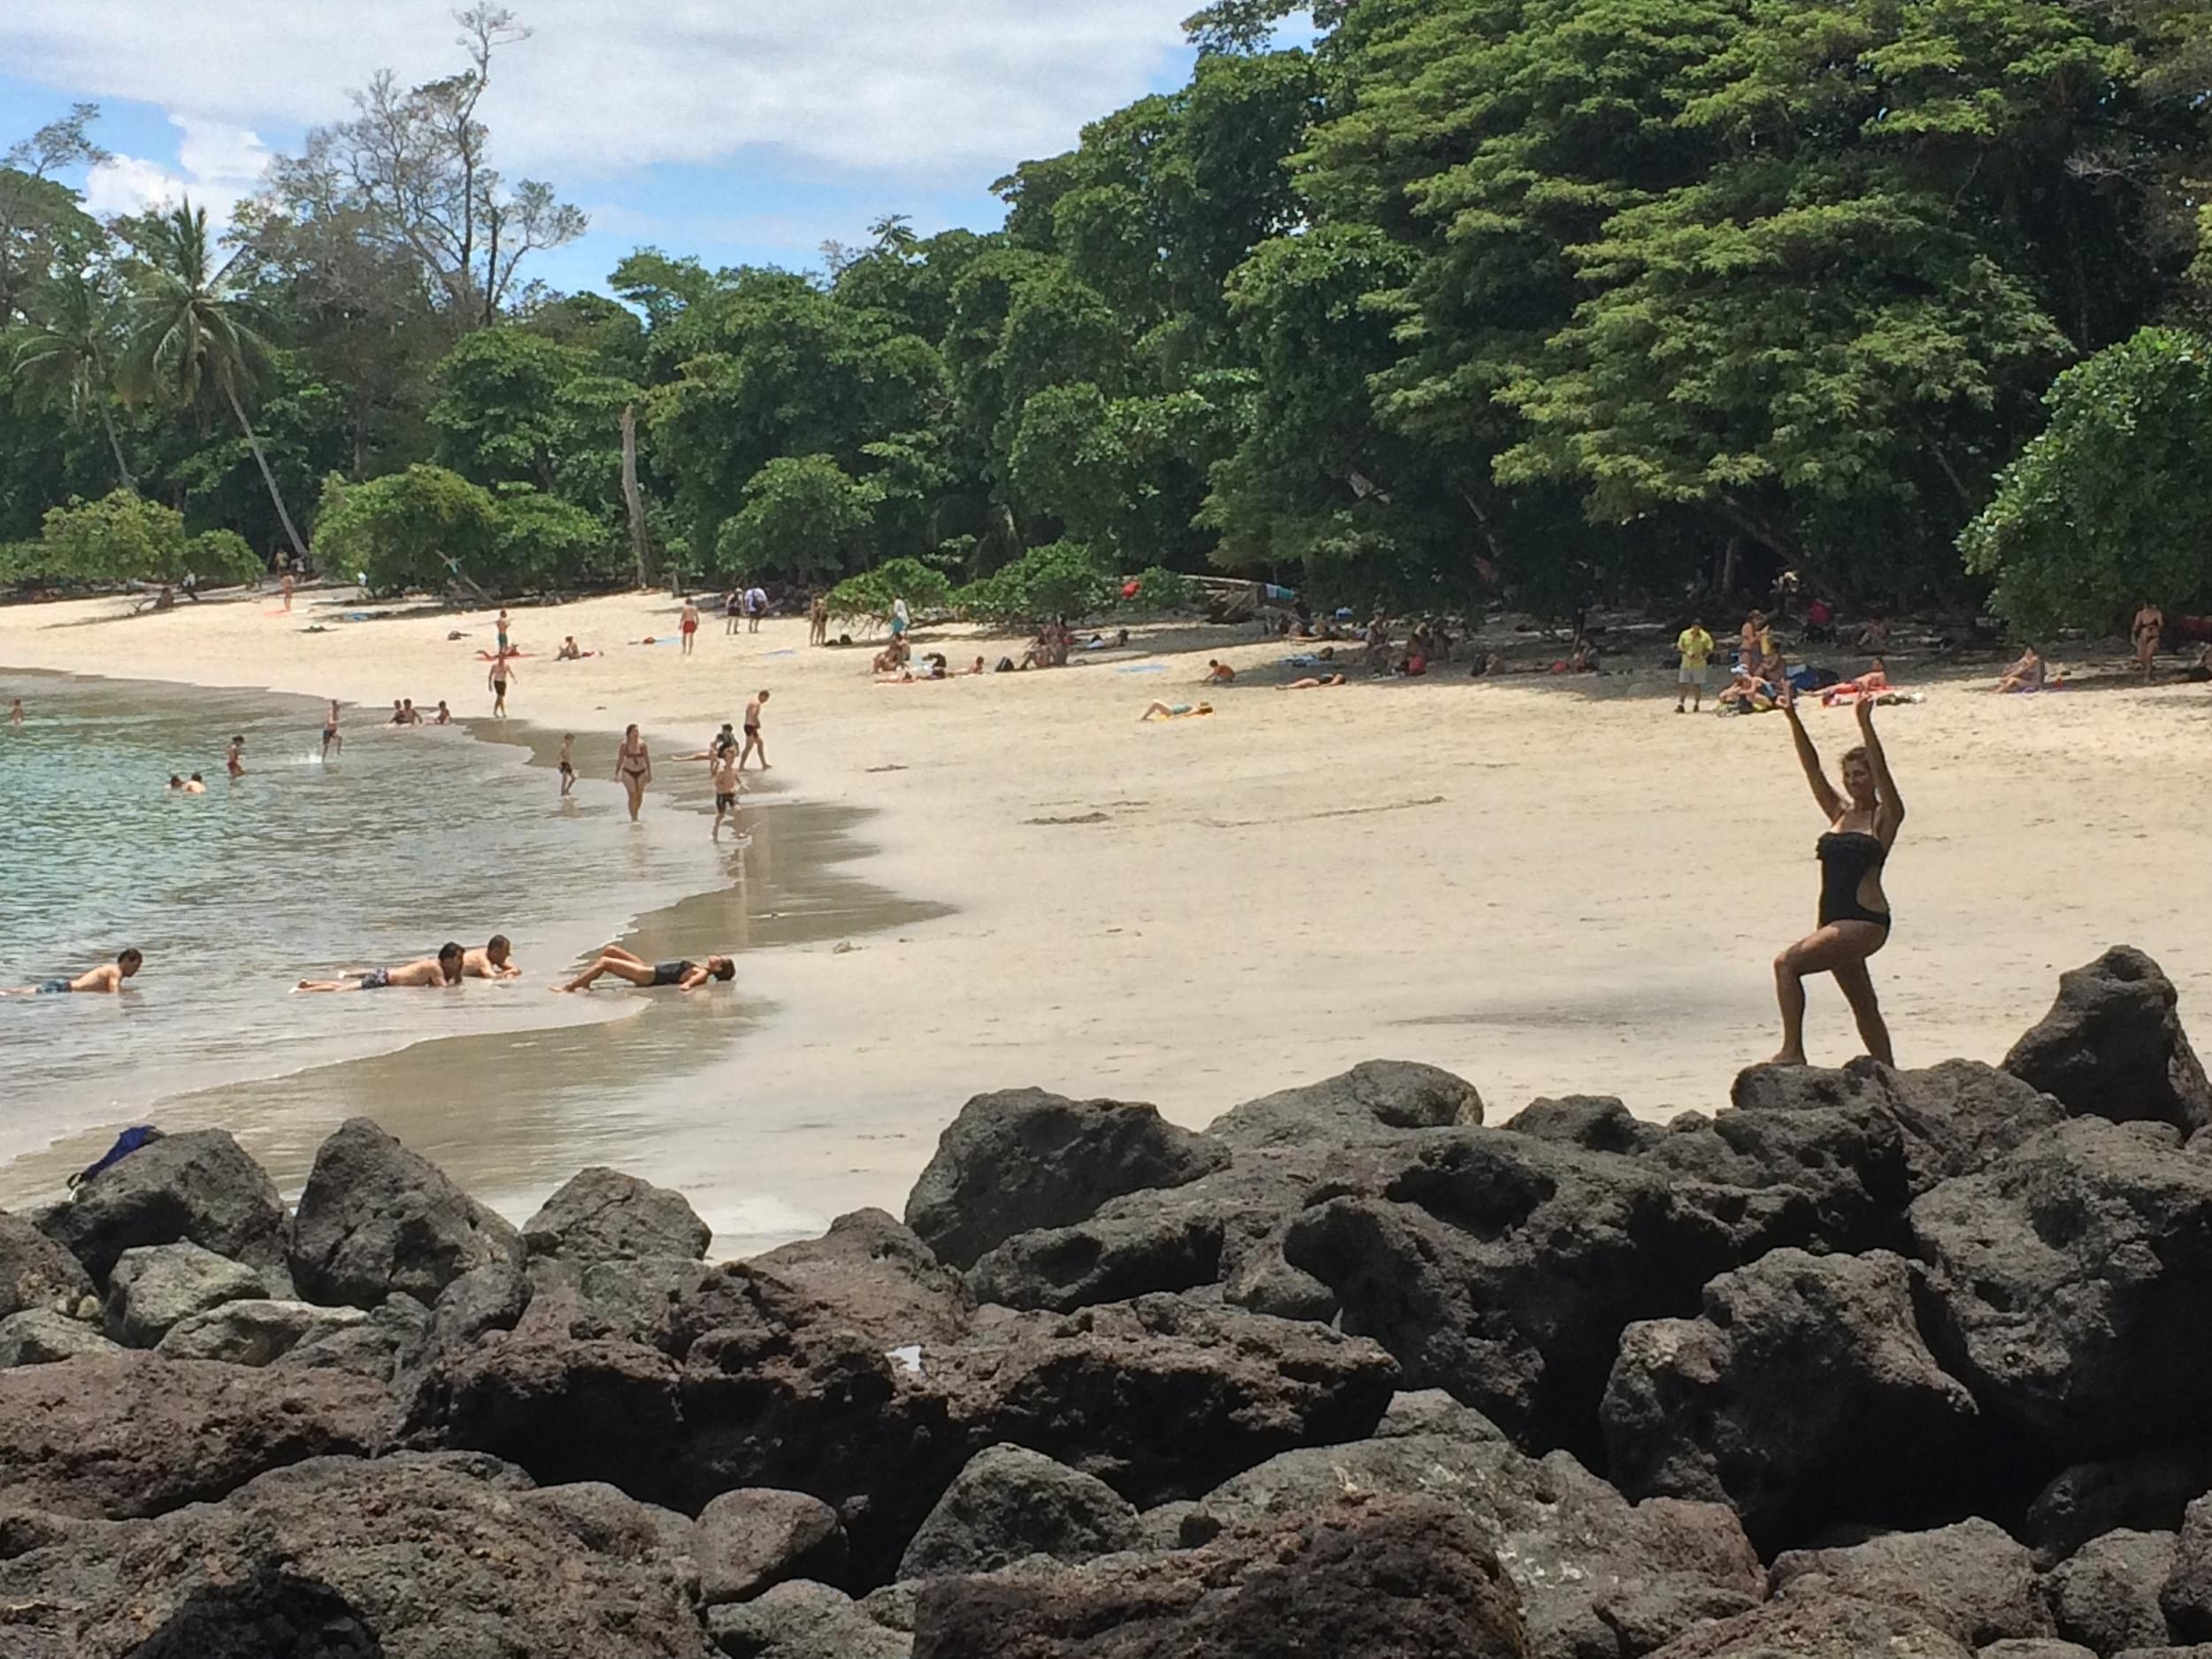 Playa Manuel Antonio. Manuel Antonio is regarded as one of the world's premier National Parks